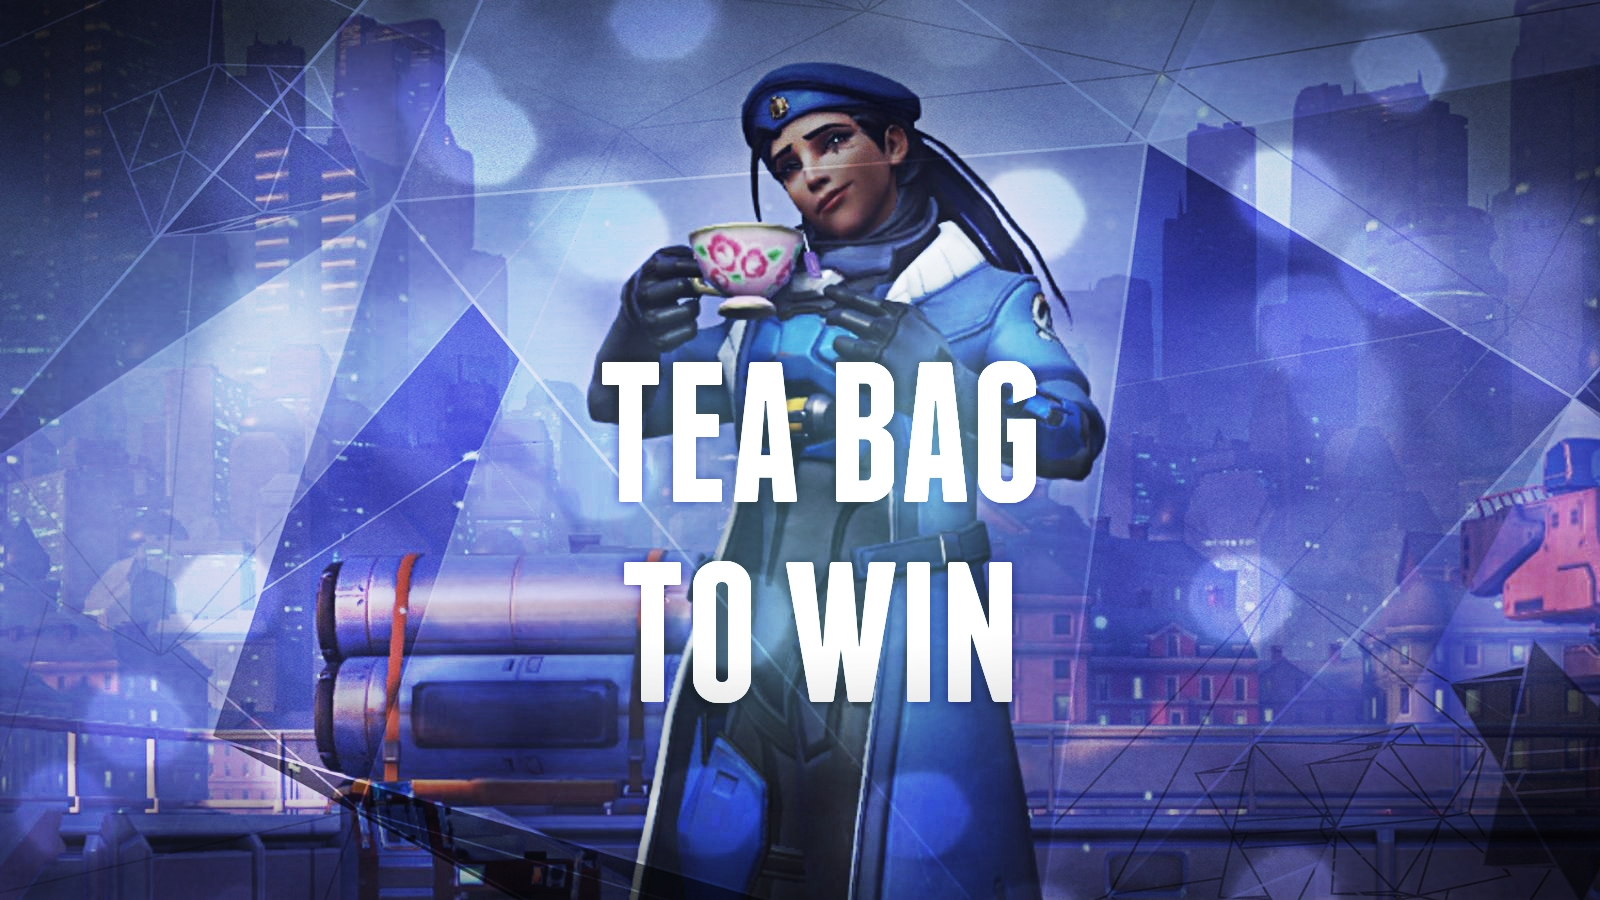 Thumbnail for TEA BAG TO WIN